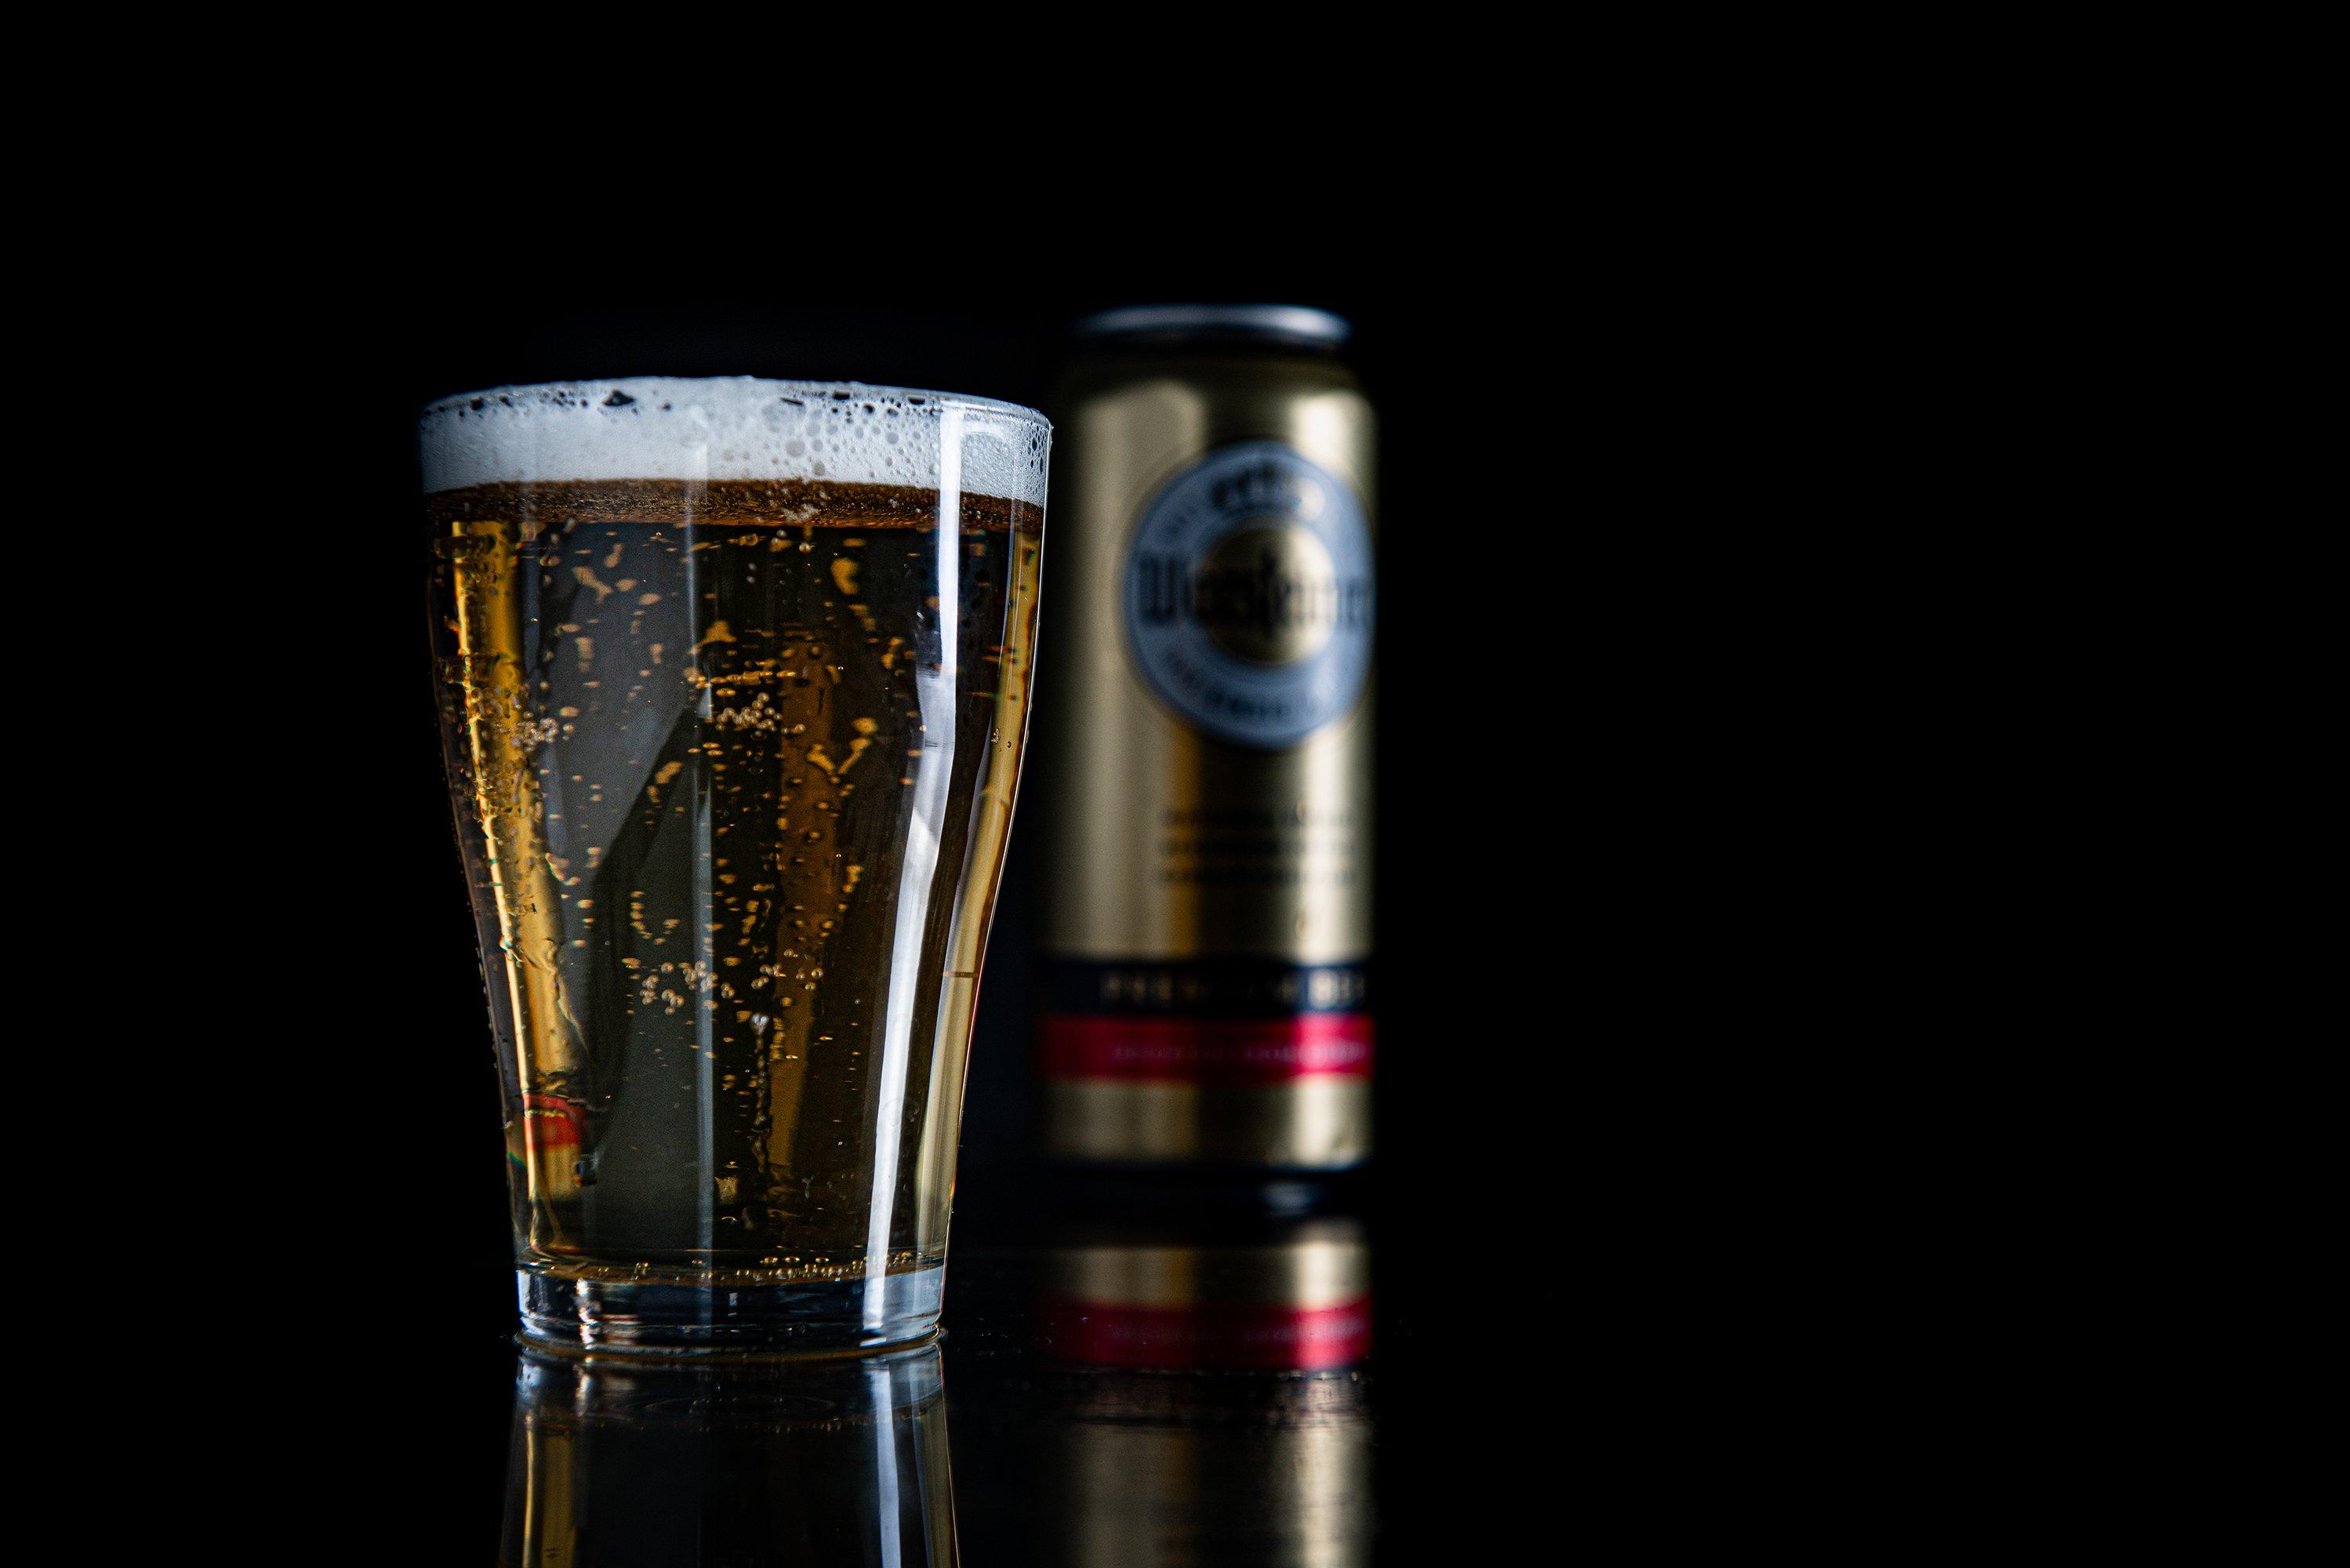 Aluminium can of Warsteiner Beer on black background example image 1